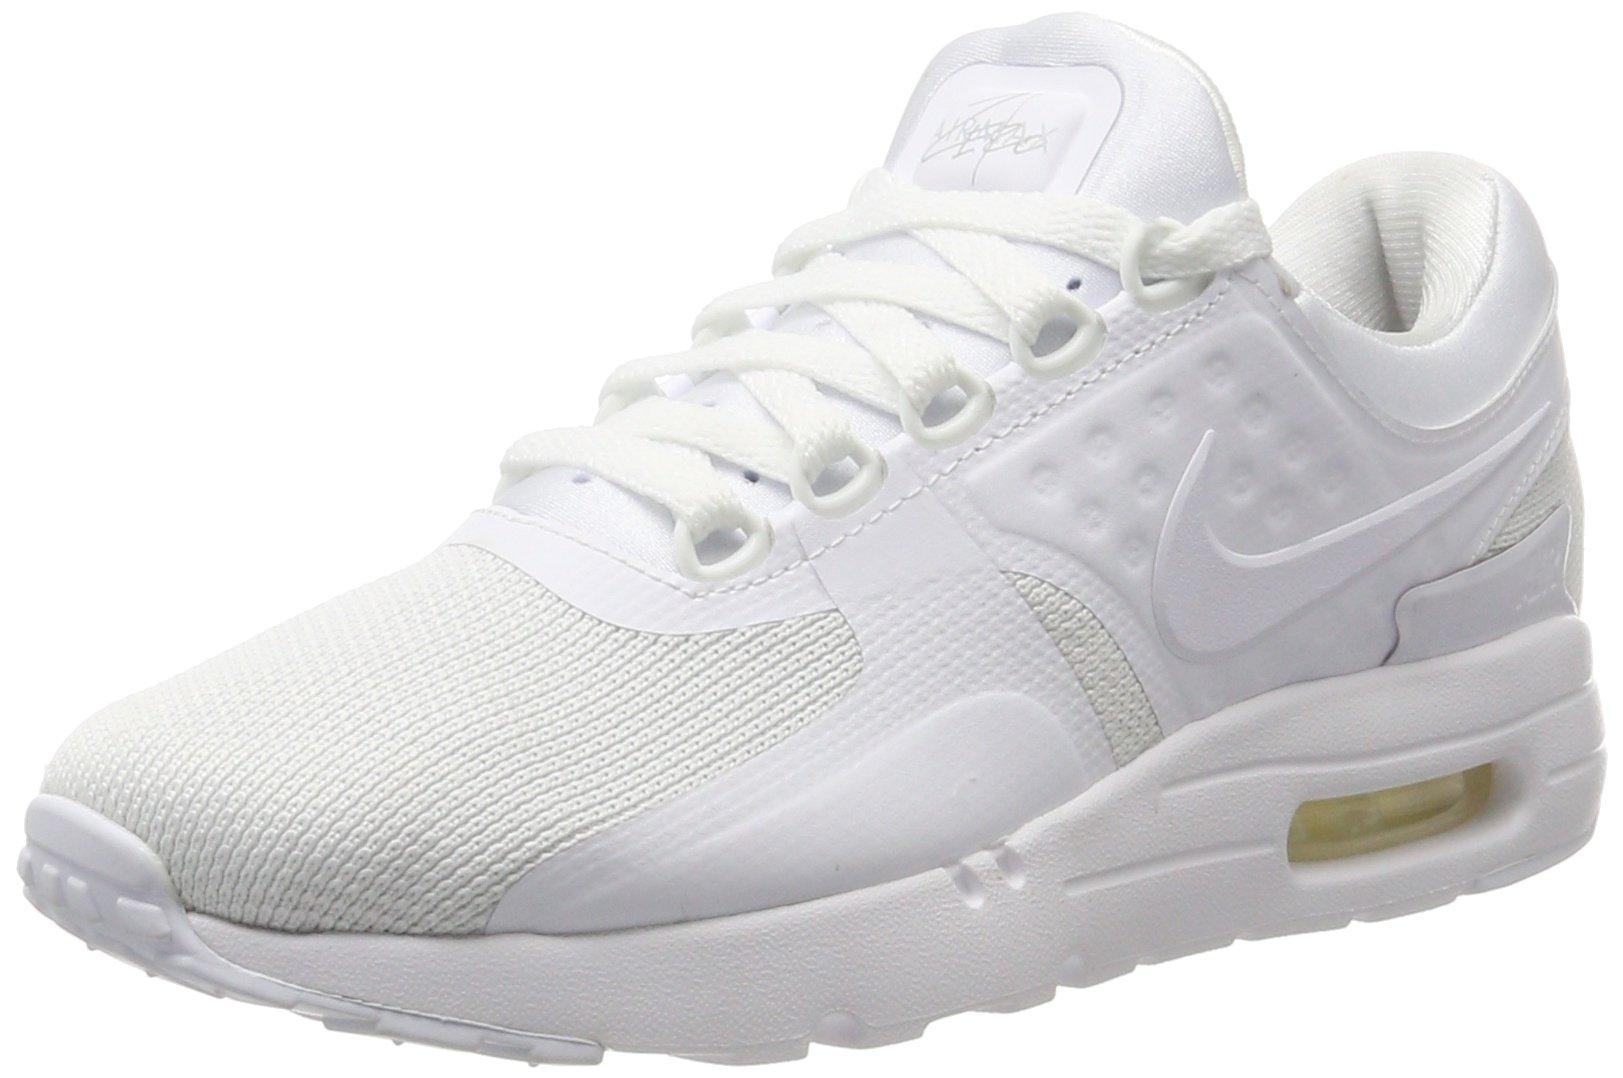 Nike Air Max Zero Essential, Eu Shoe Size:EUR 47